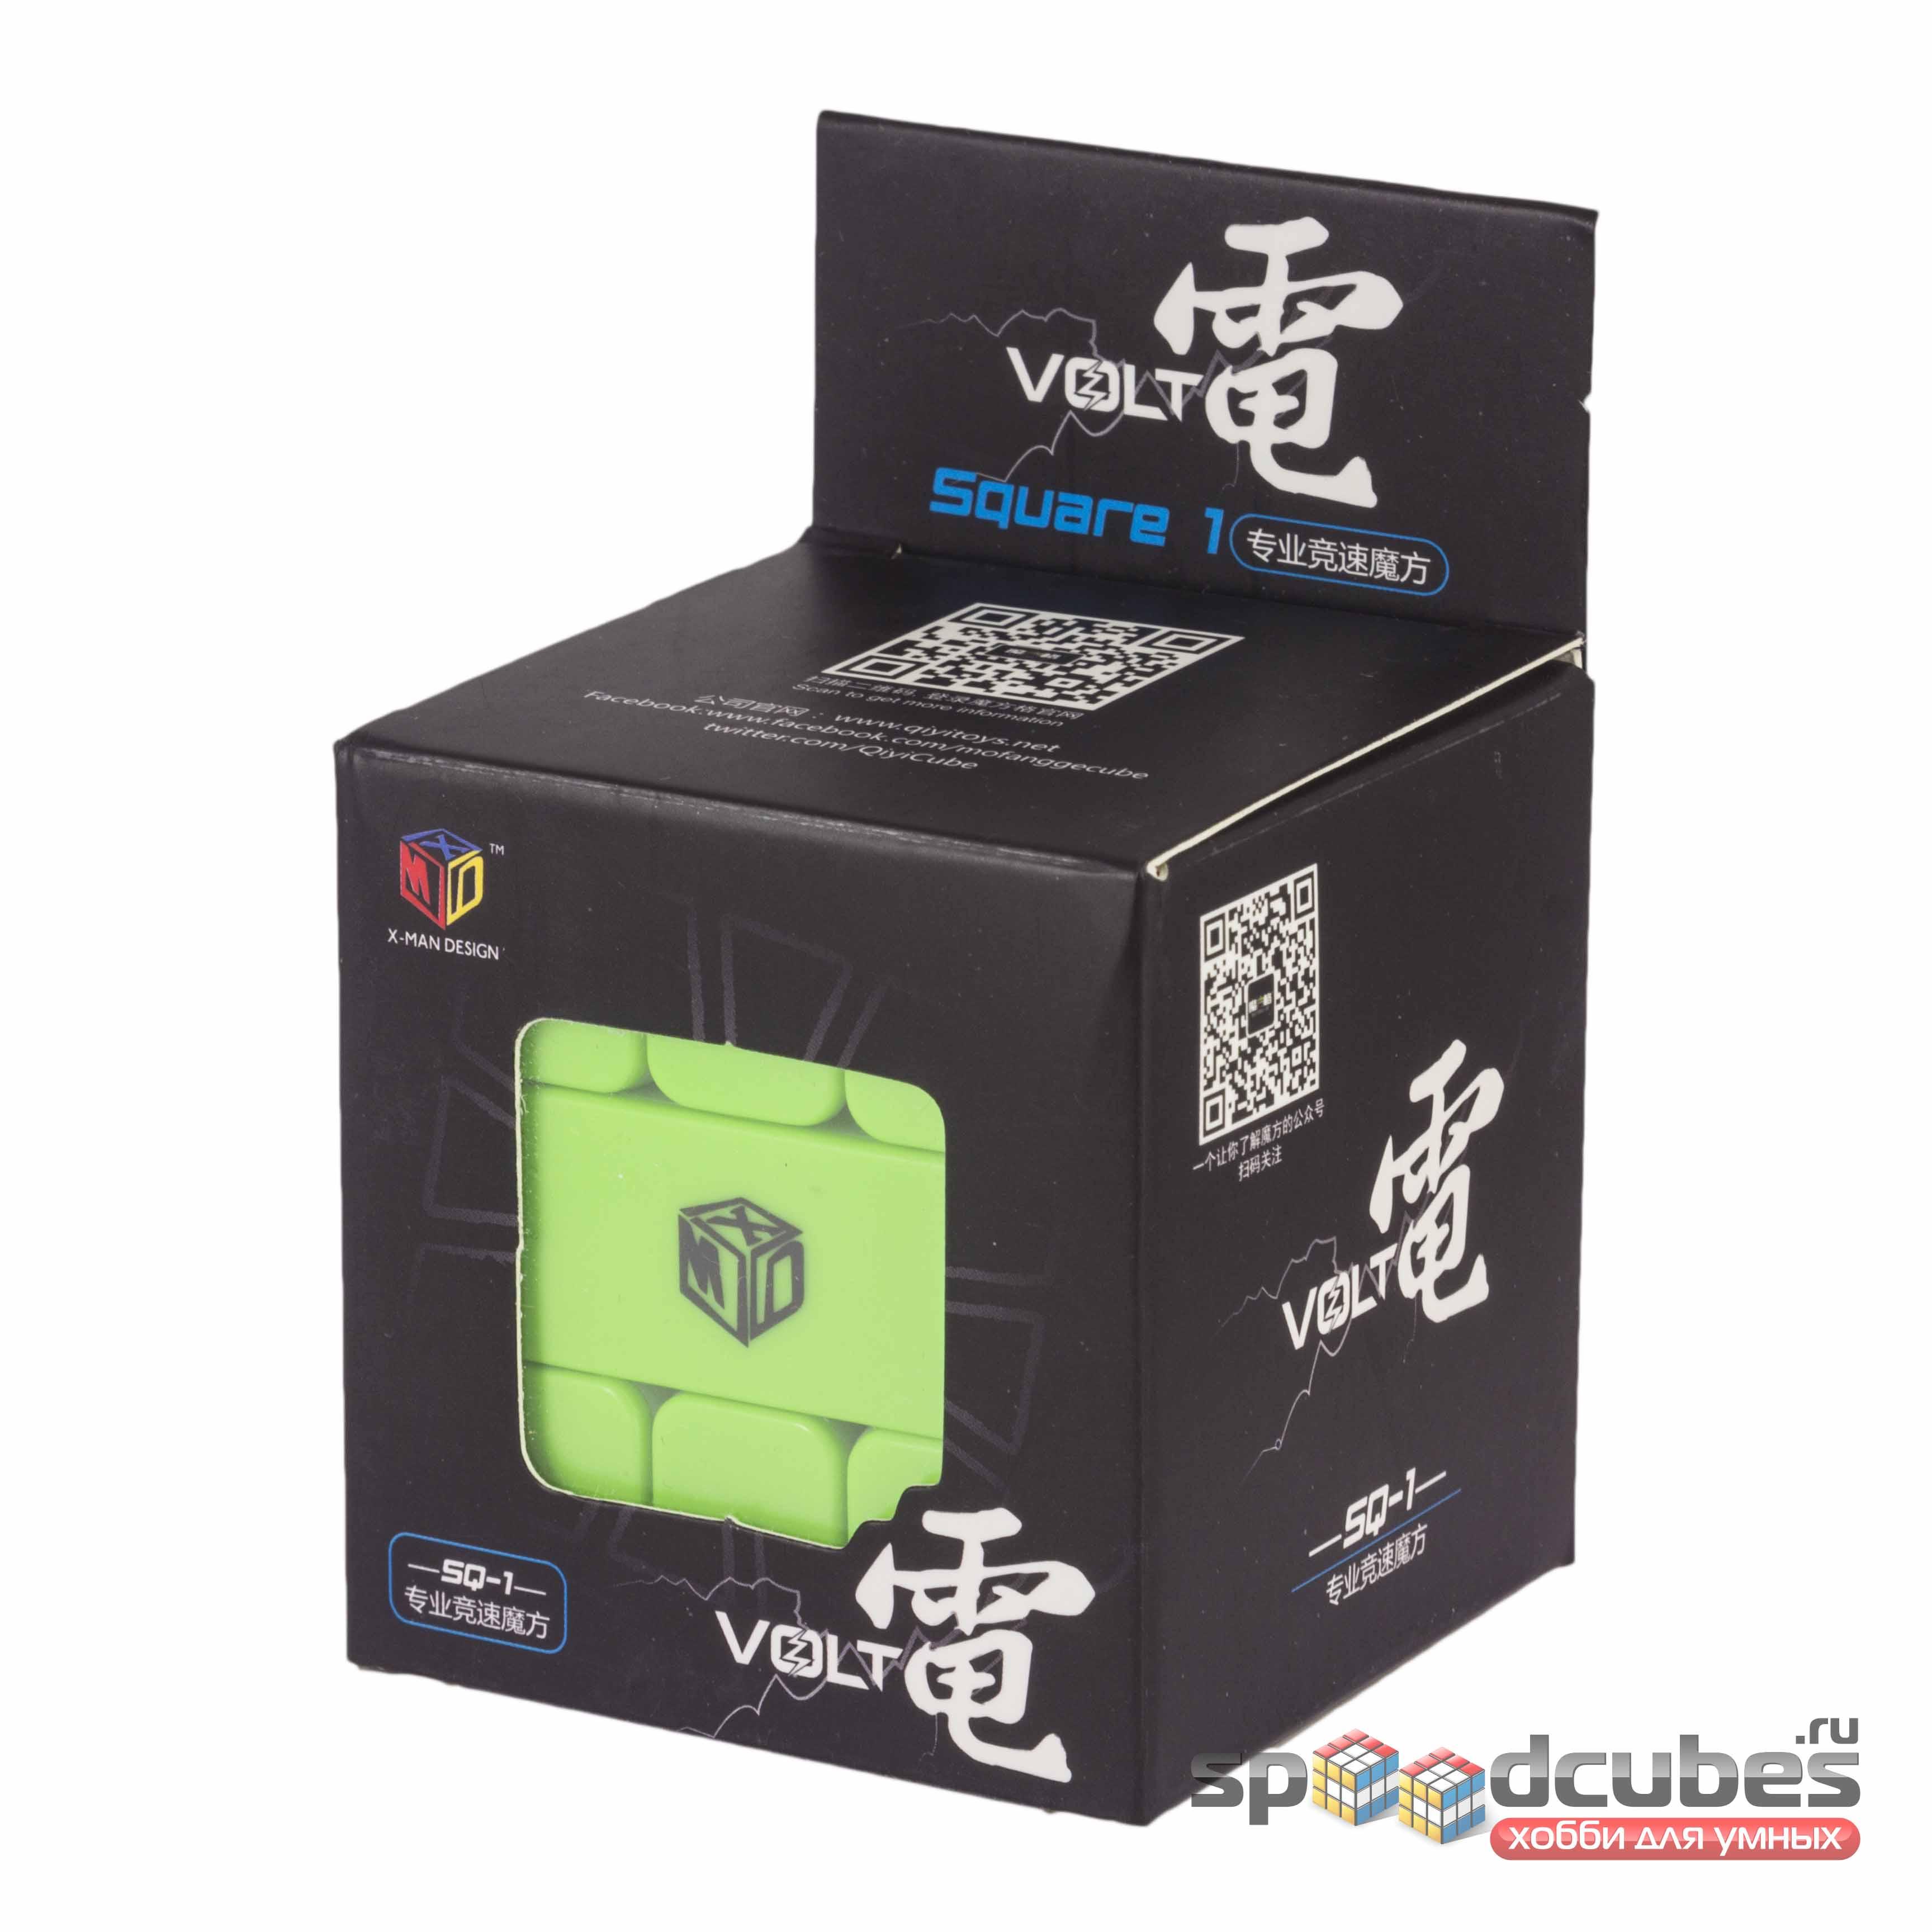 QiYi (MoFangGe) X Man Volt Square 1 Color 1